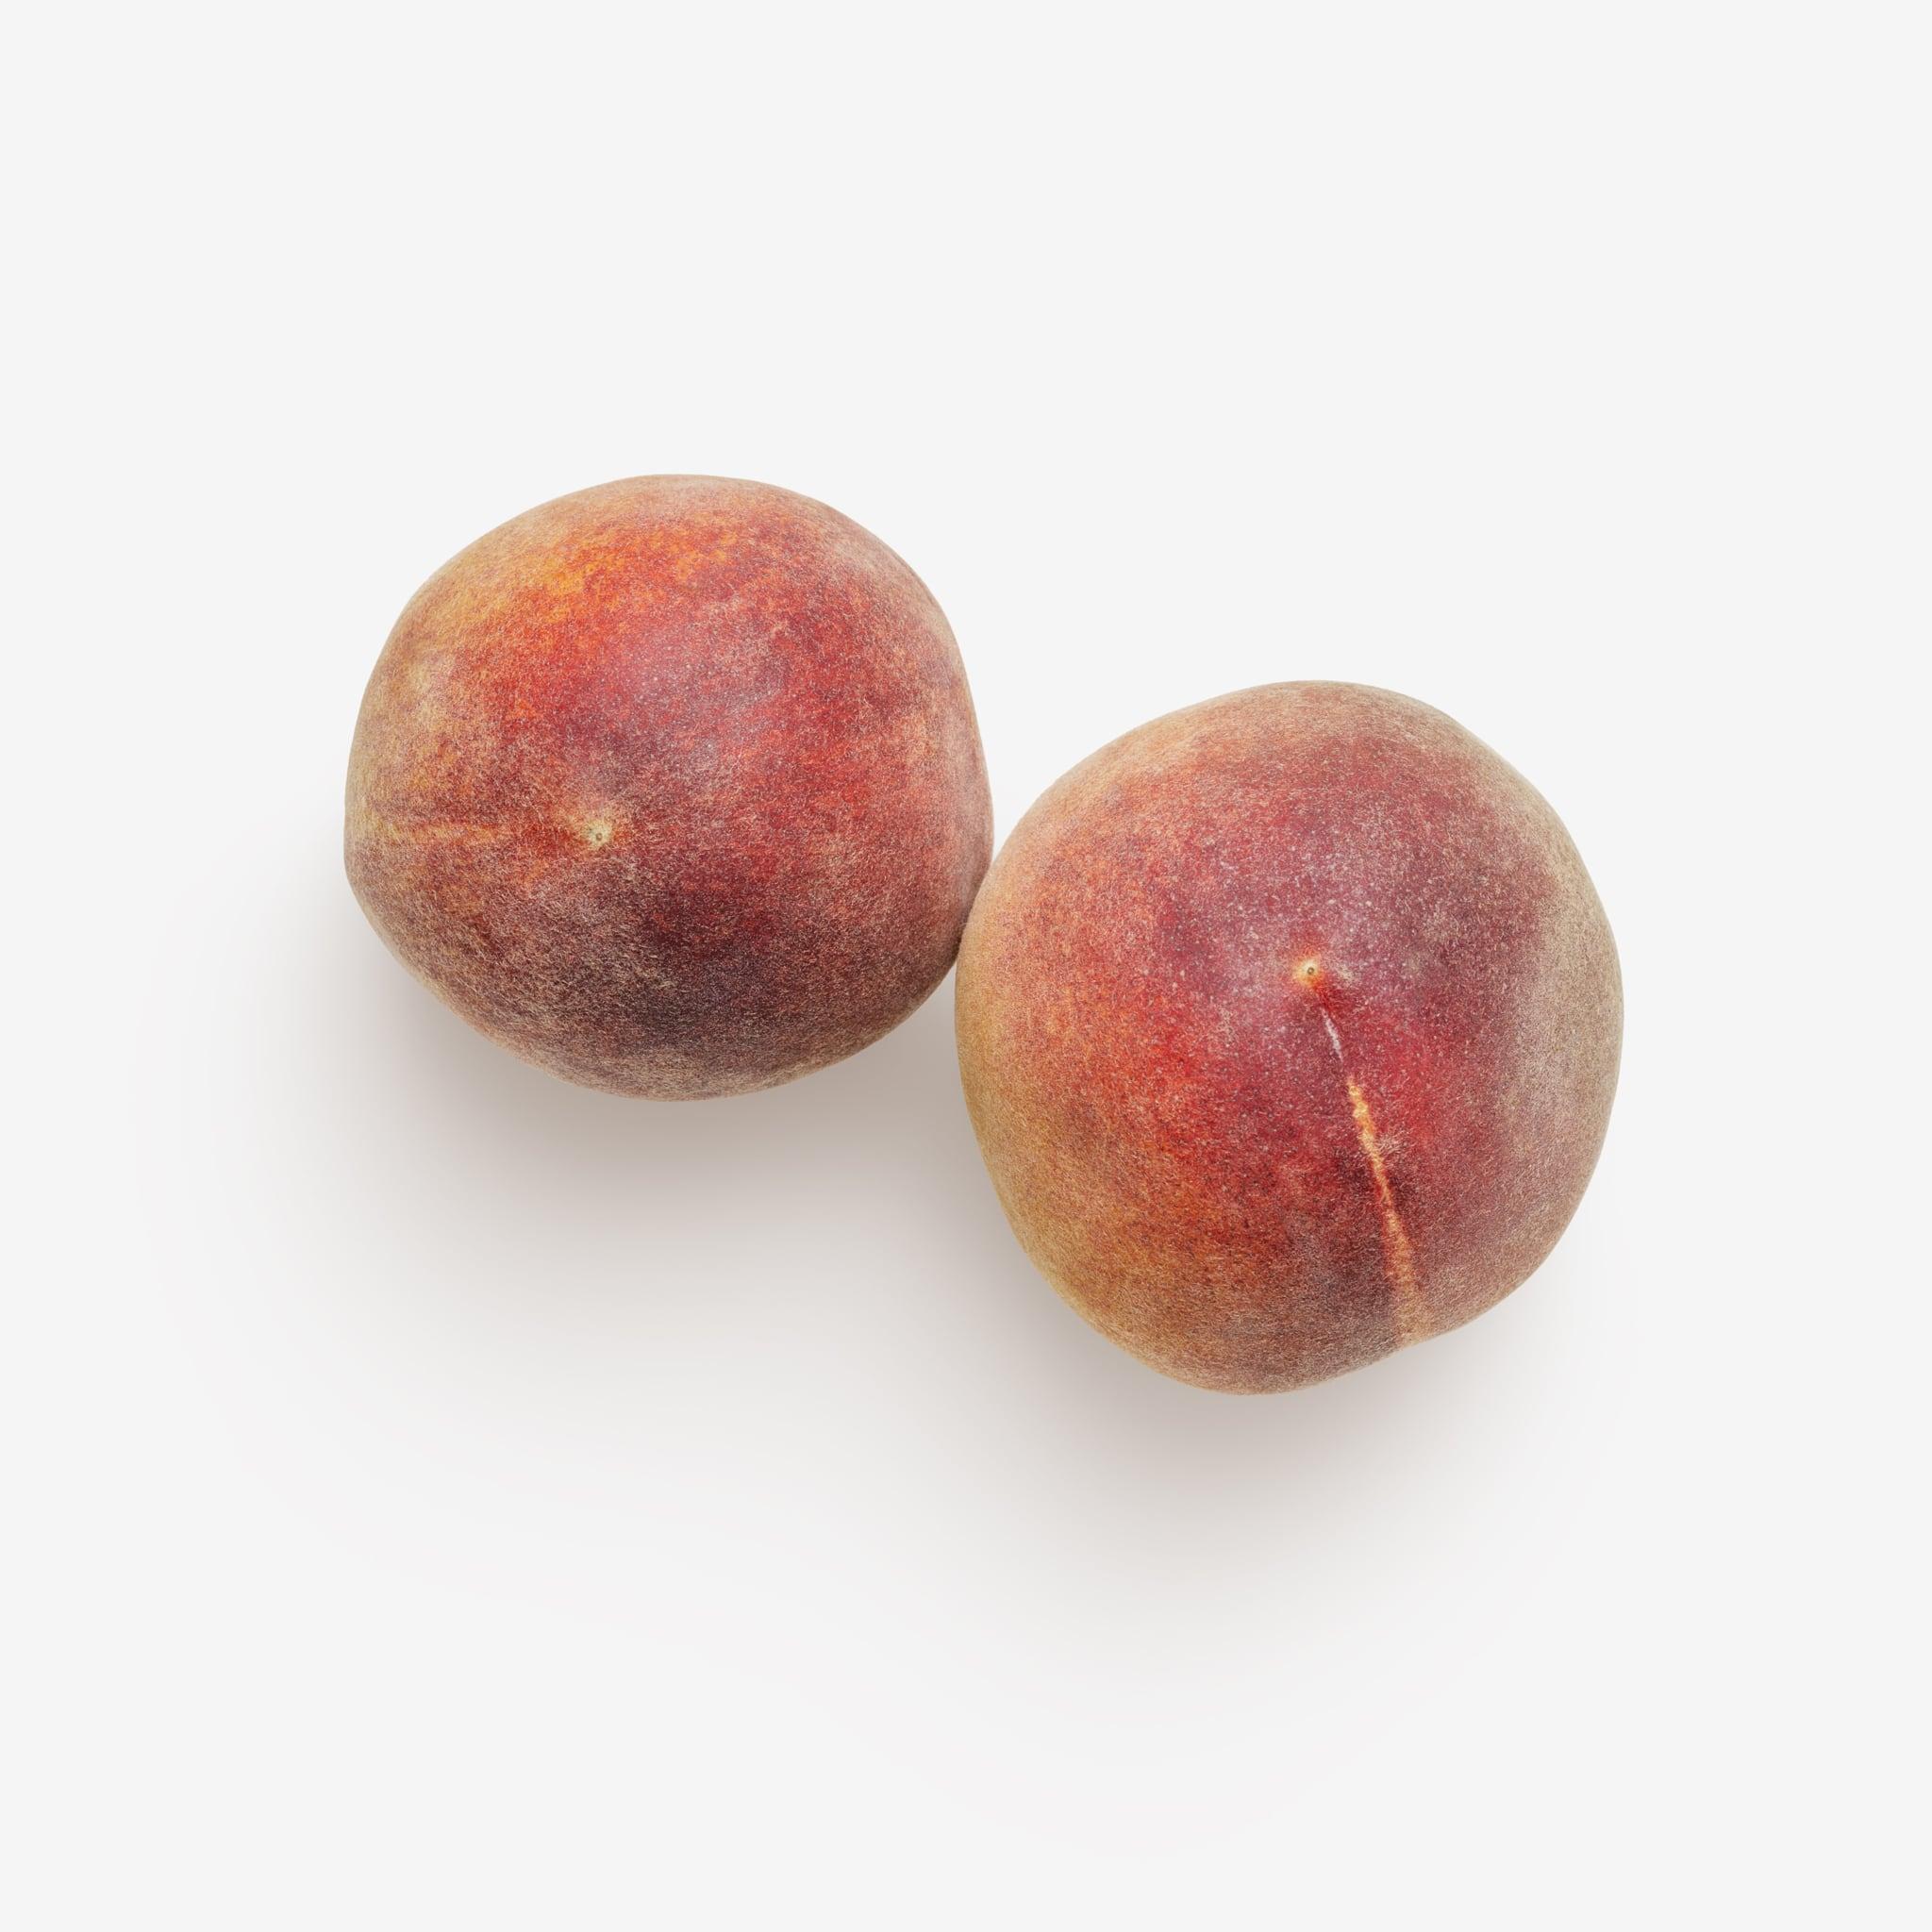 PSD Layered Peach image